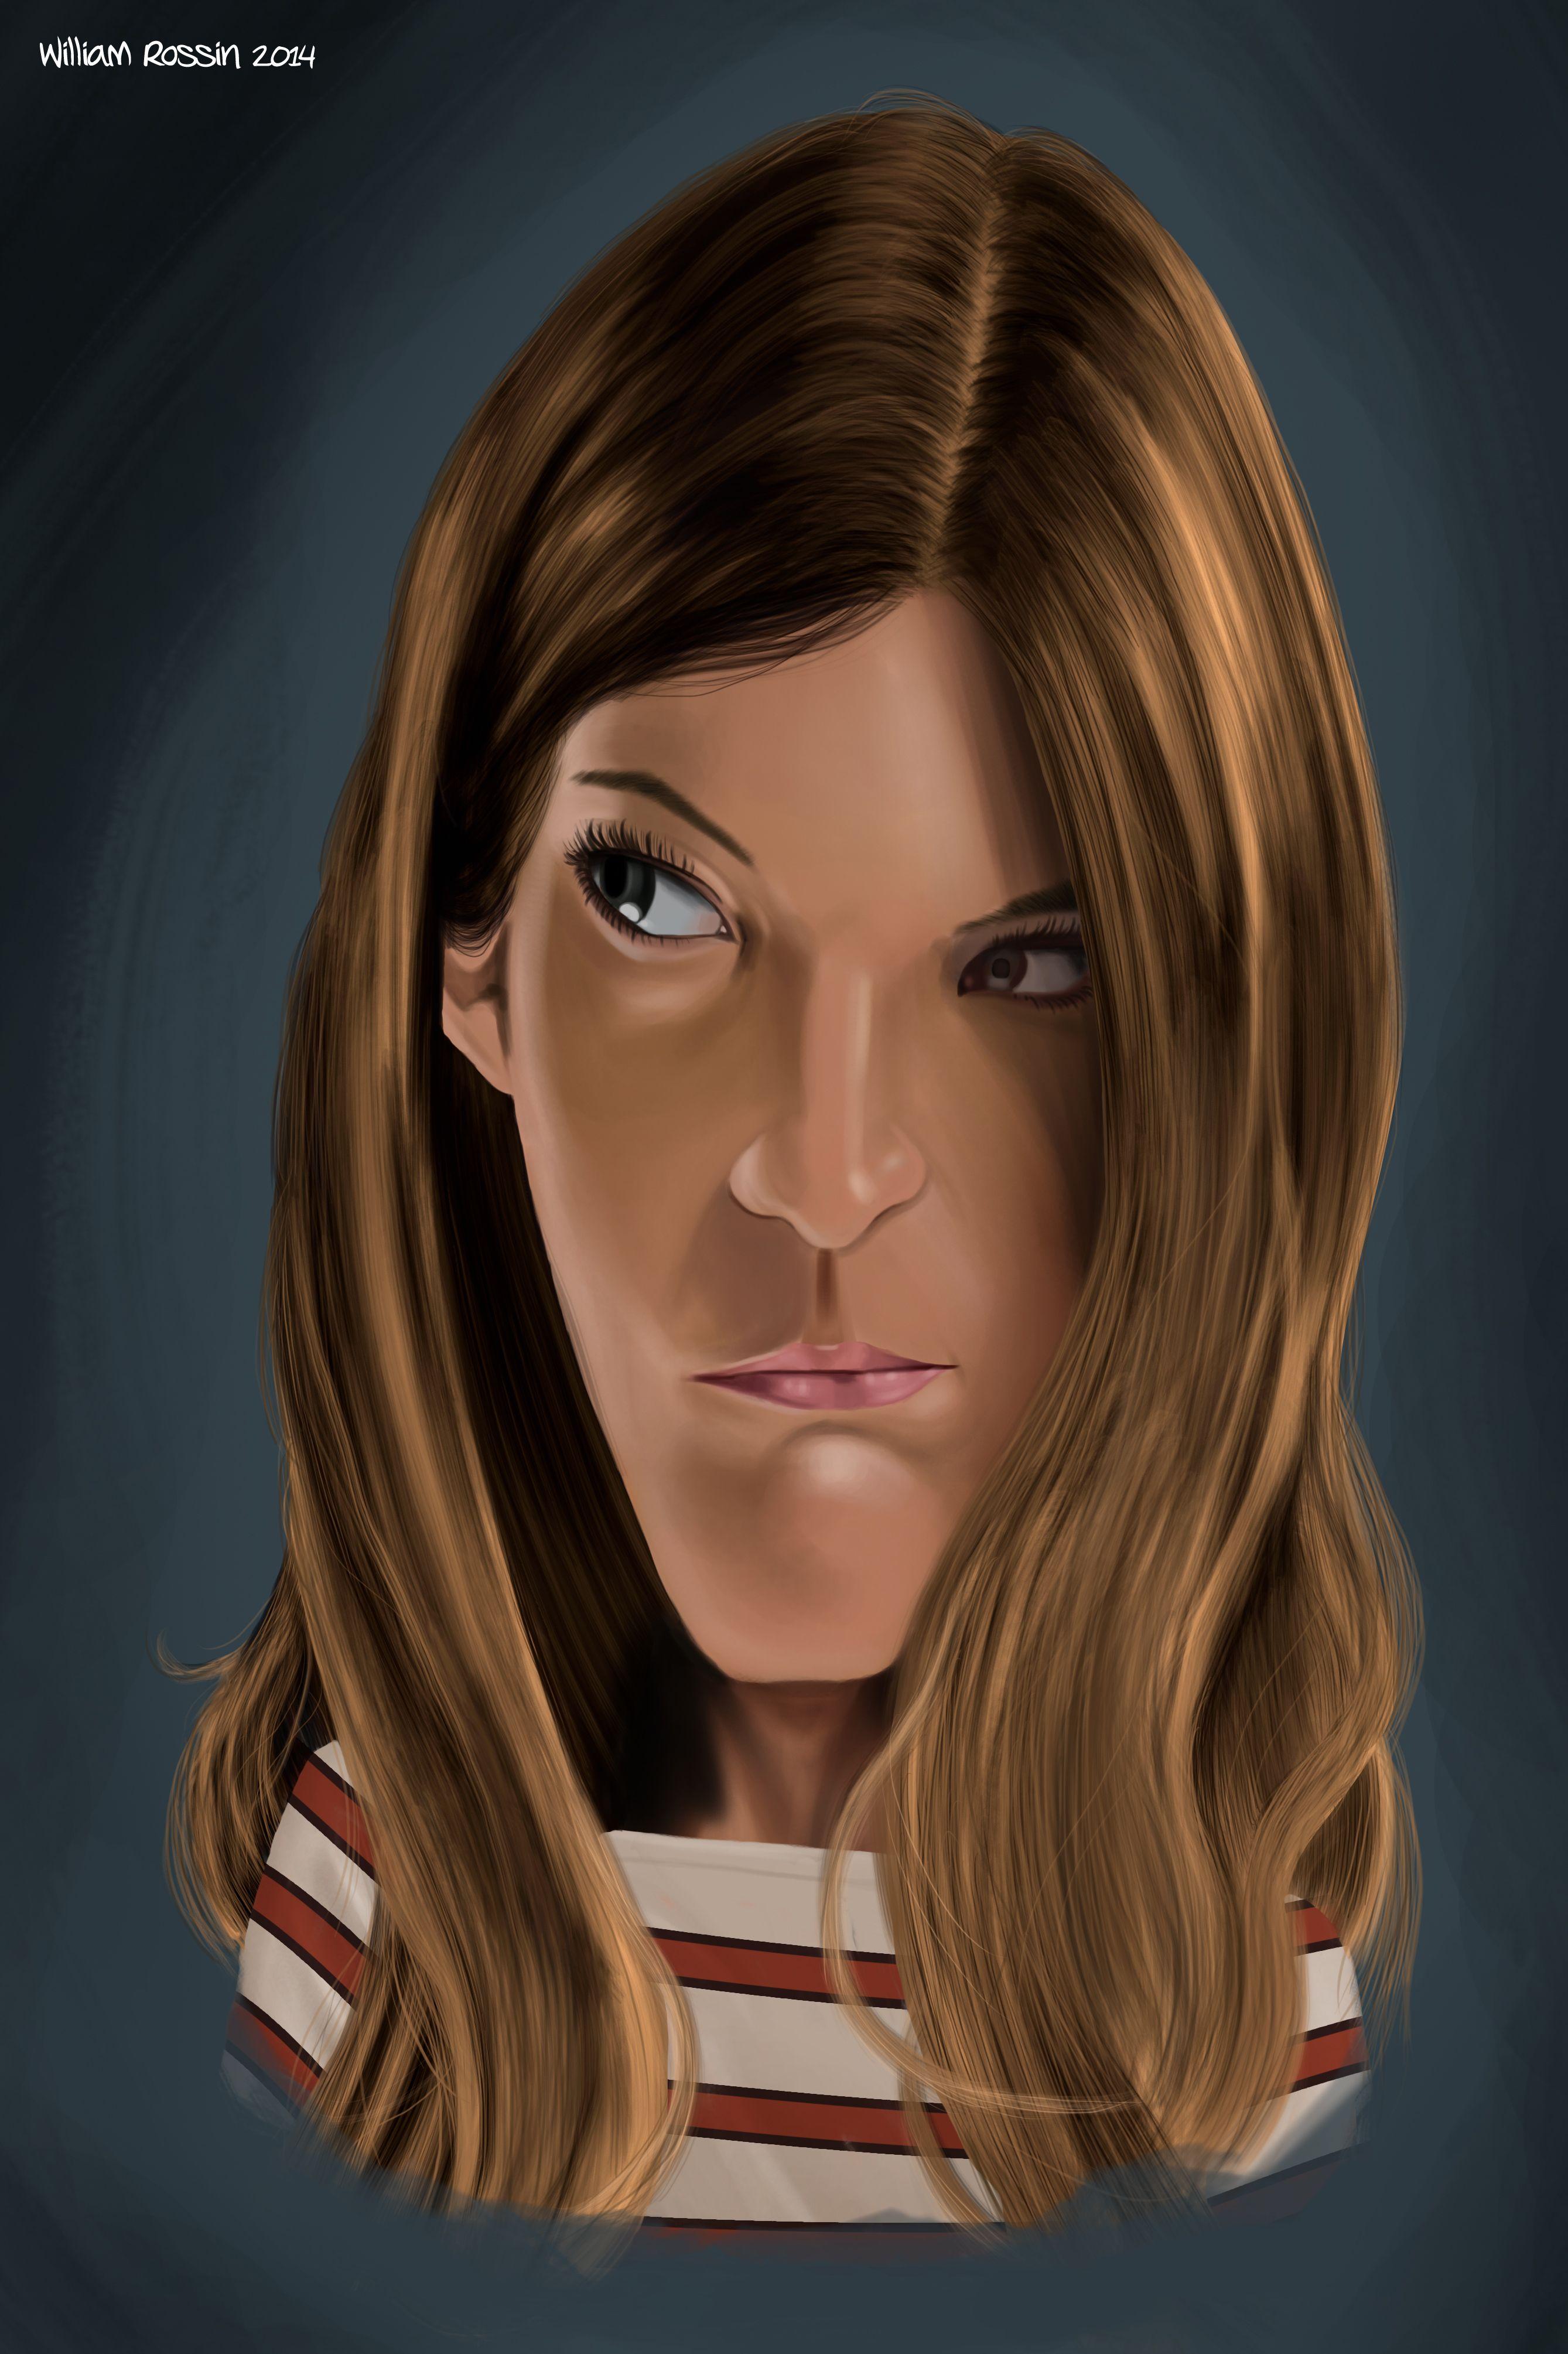 Debra Morgan Digital Painted Caricature Of The Character